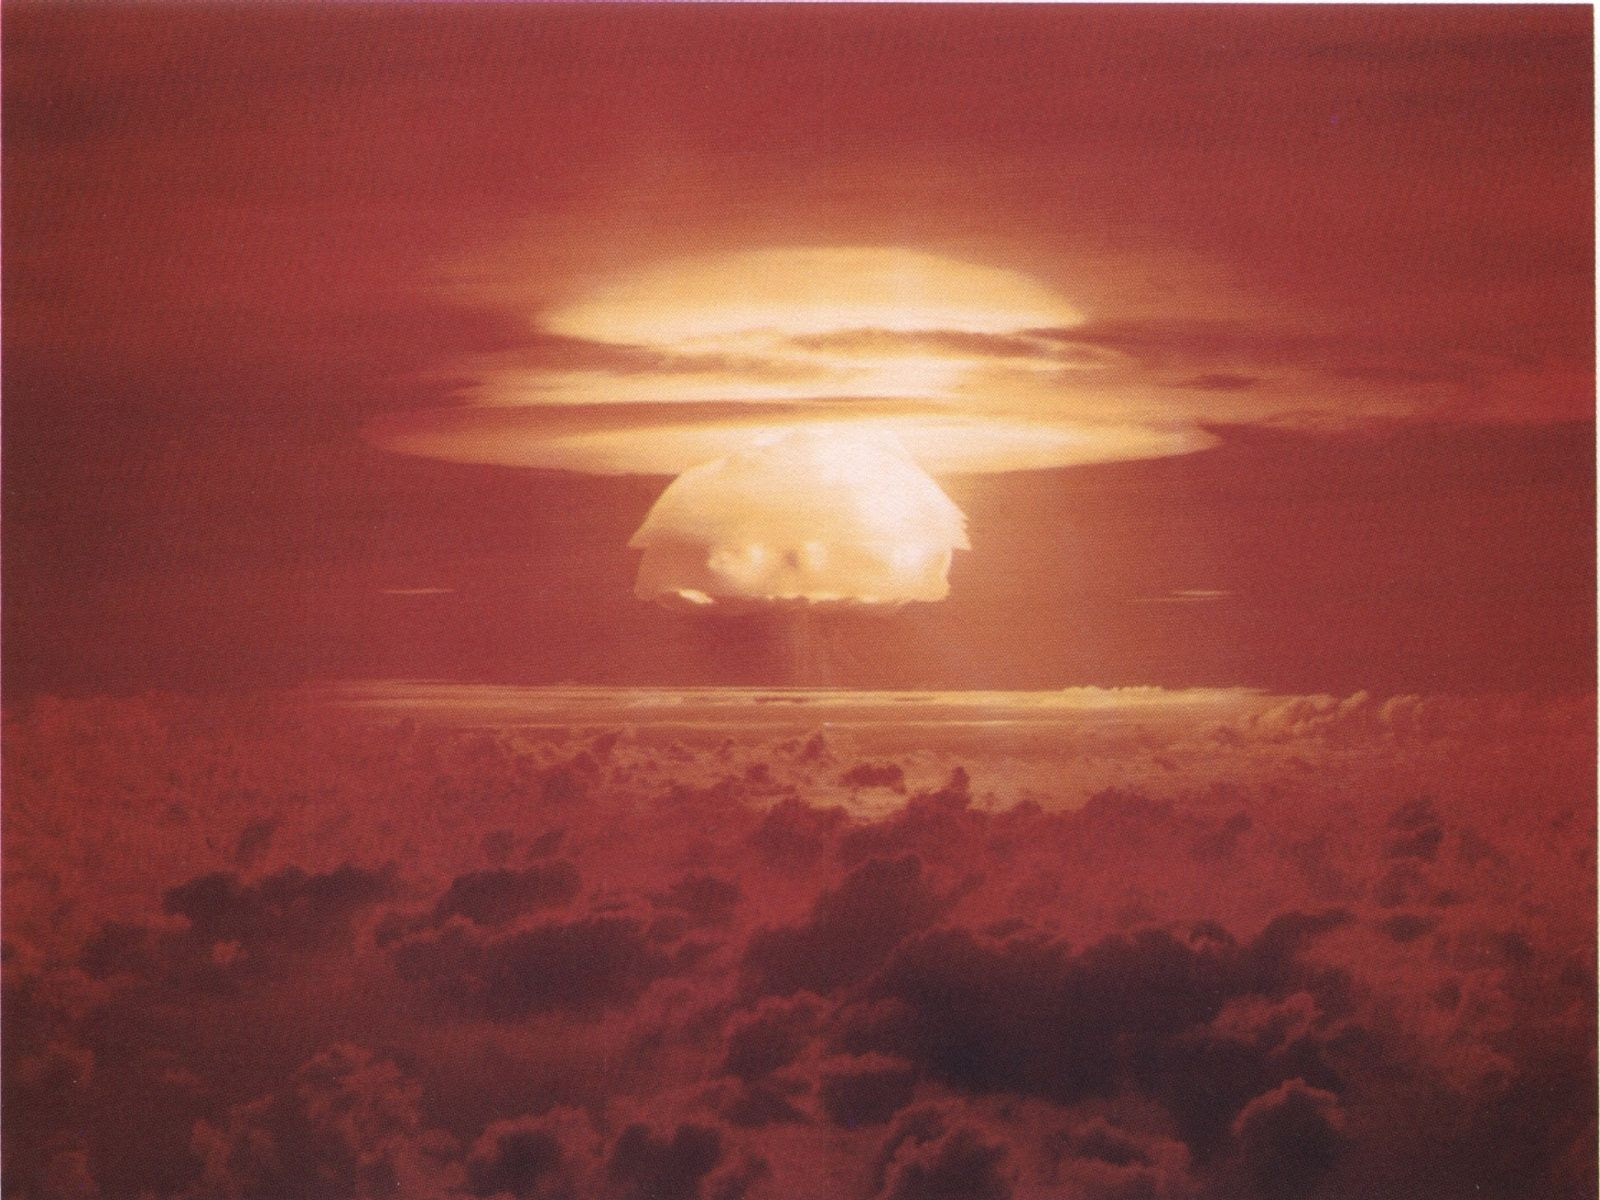 http://upload.wikimedia.org/wikipedia/commons/5/5d/Castle_Bravo_Blast.jpg